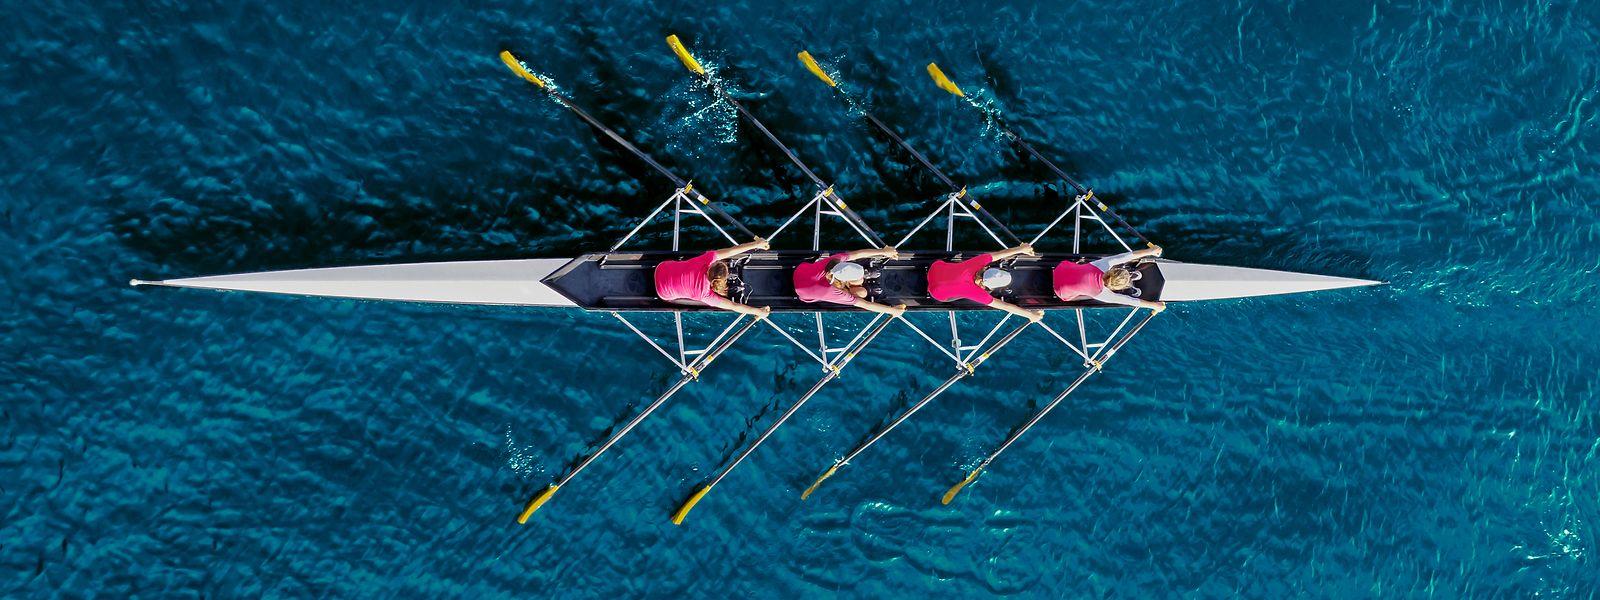 Metz envisage d'accueillir les préparations d'aviron, kayak, handball ou tennis de table.